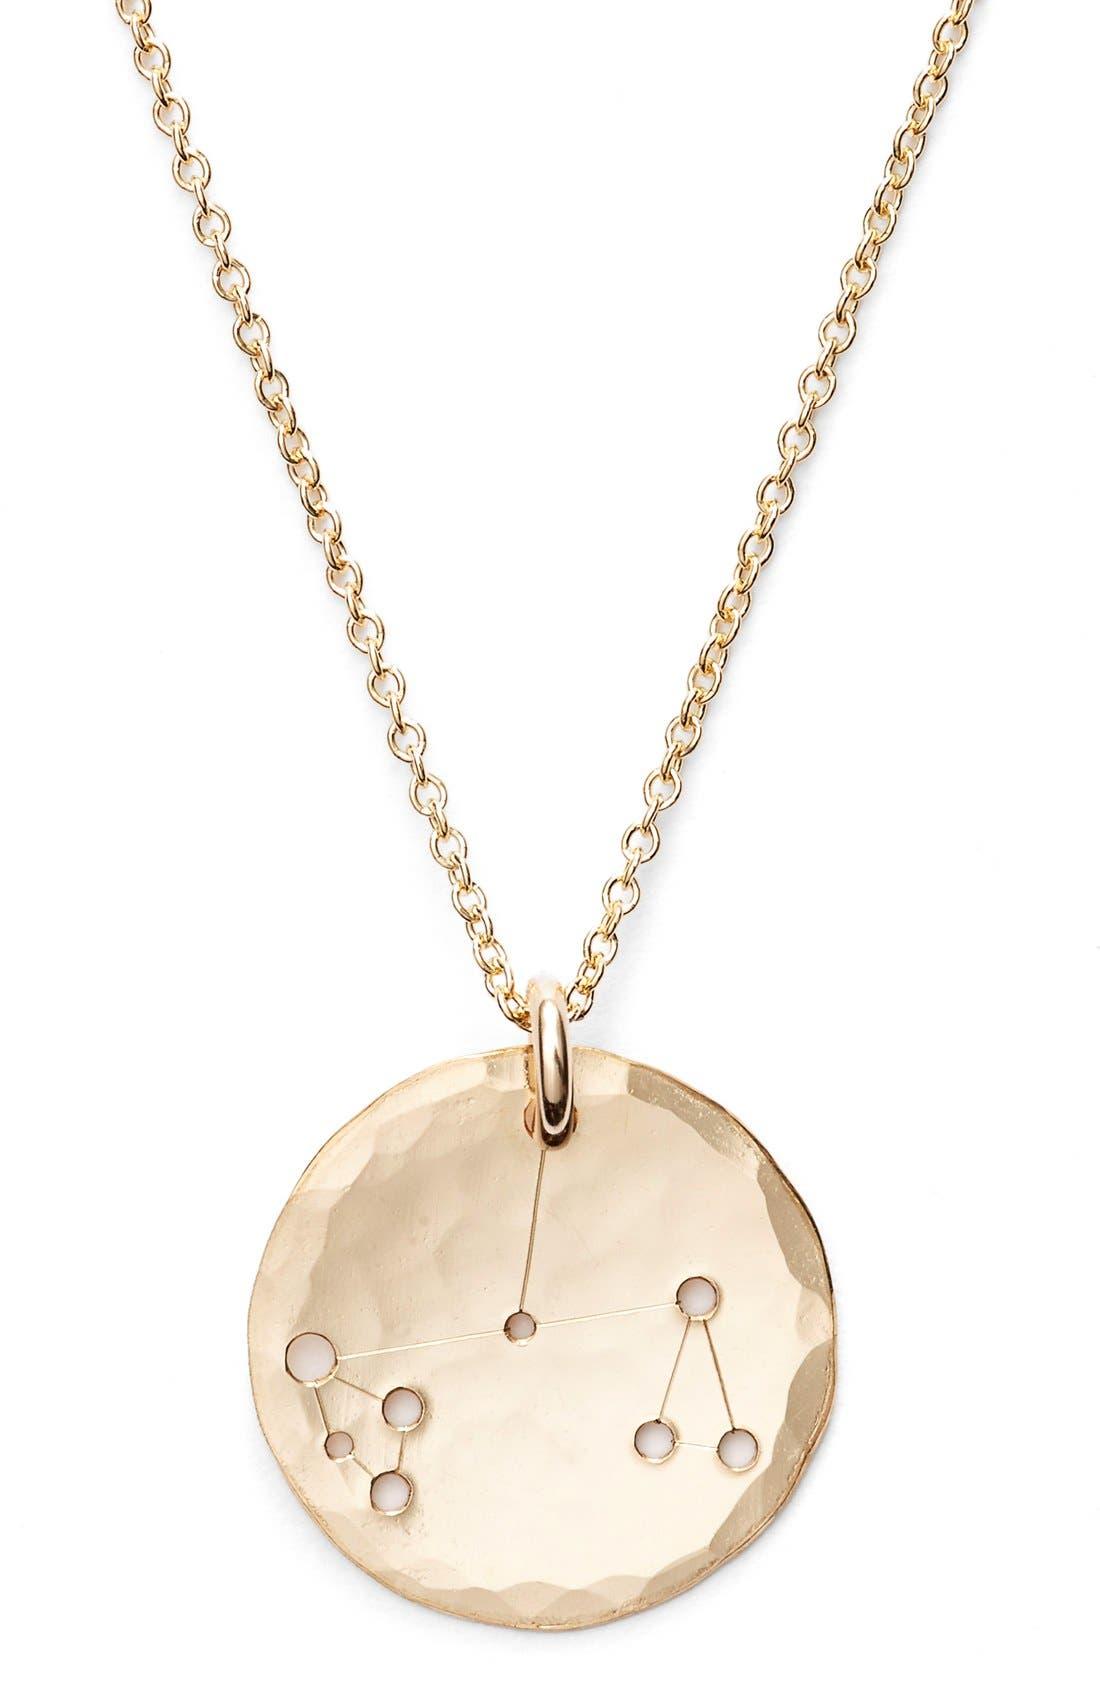 Ija 'Small Zodiac' 14k-Gold Fill Necklace,                             Alternate thumbnail 31, color,